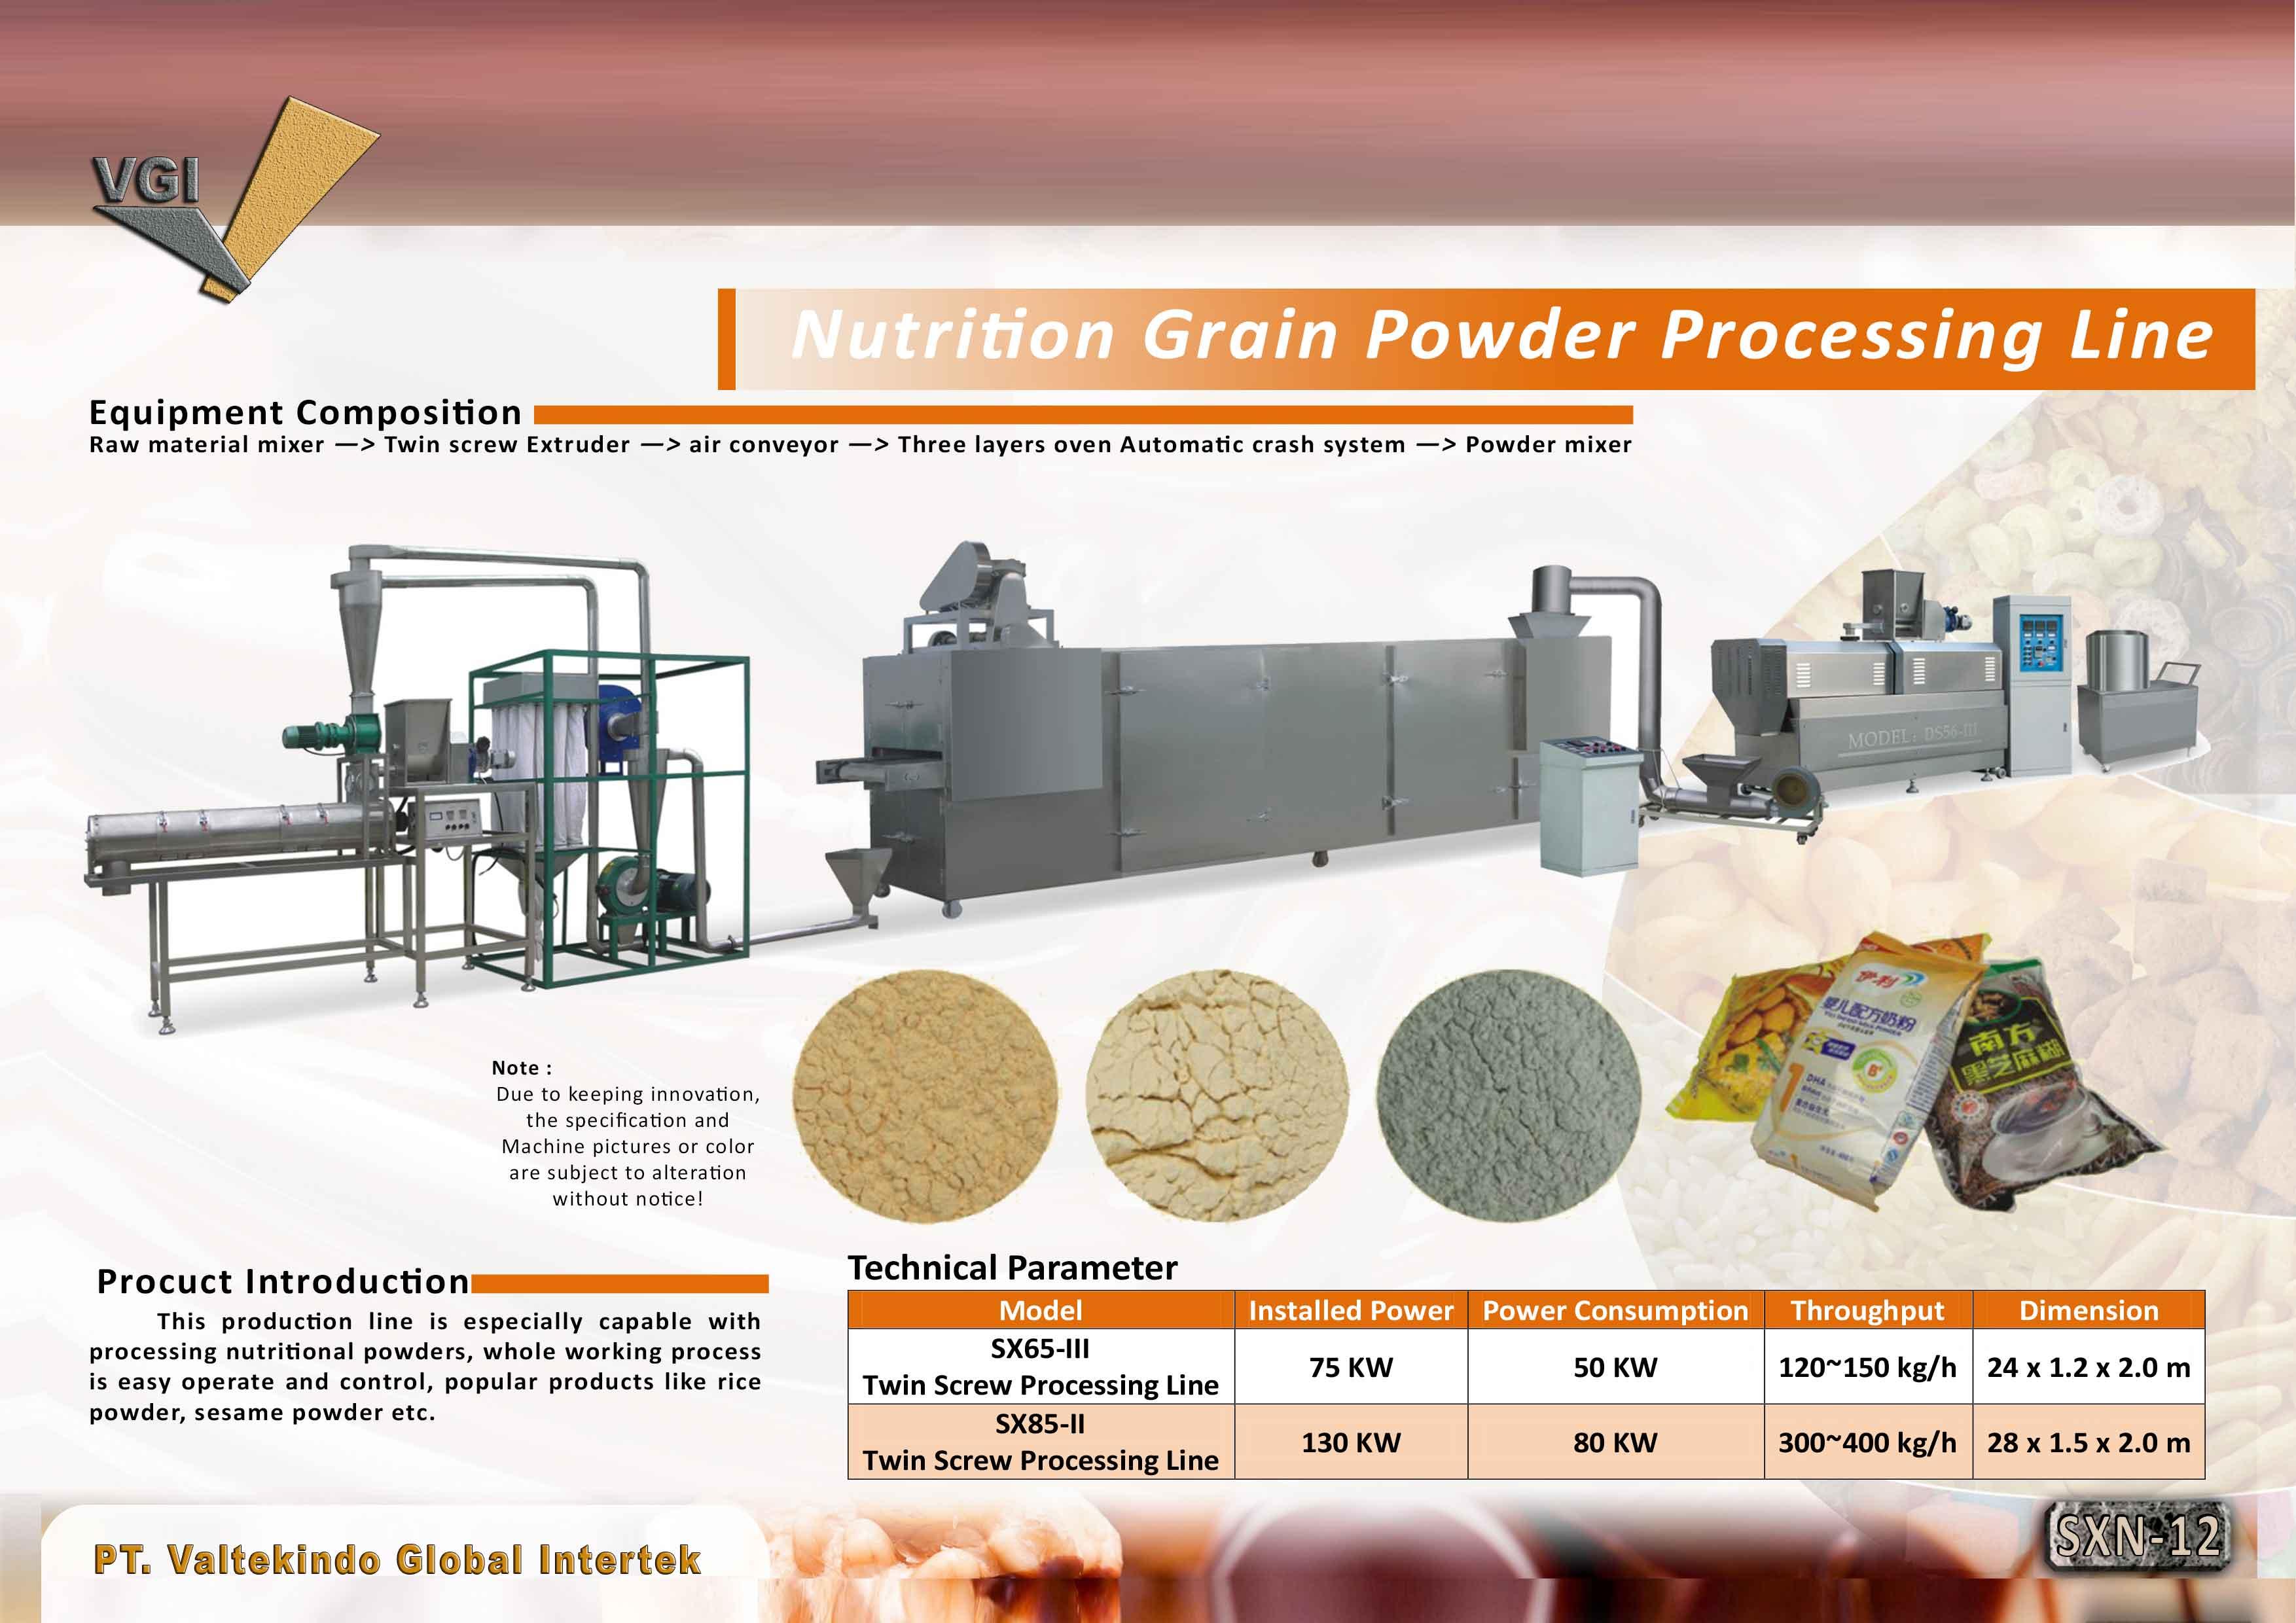 jual mesin Nutrition Grain Powder Processing Nutrition Grain Powder Processing